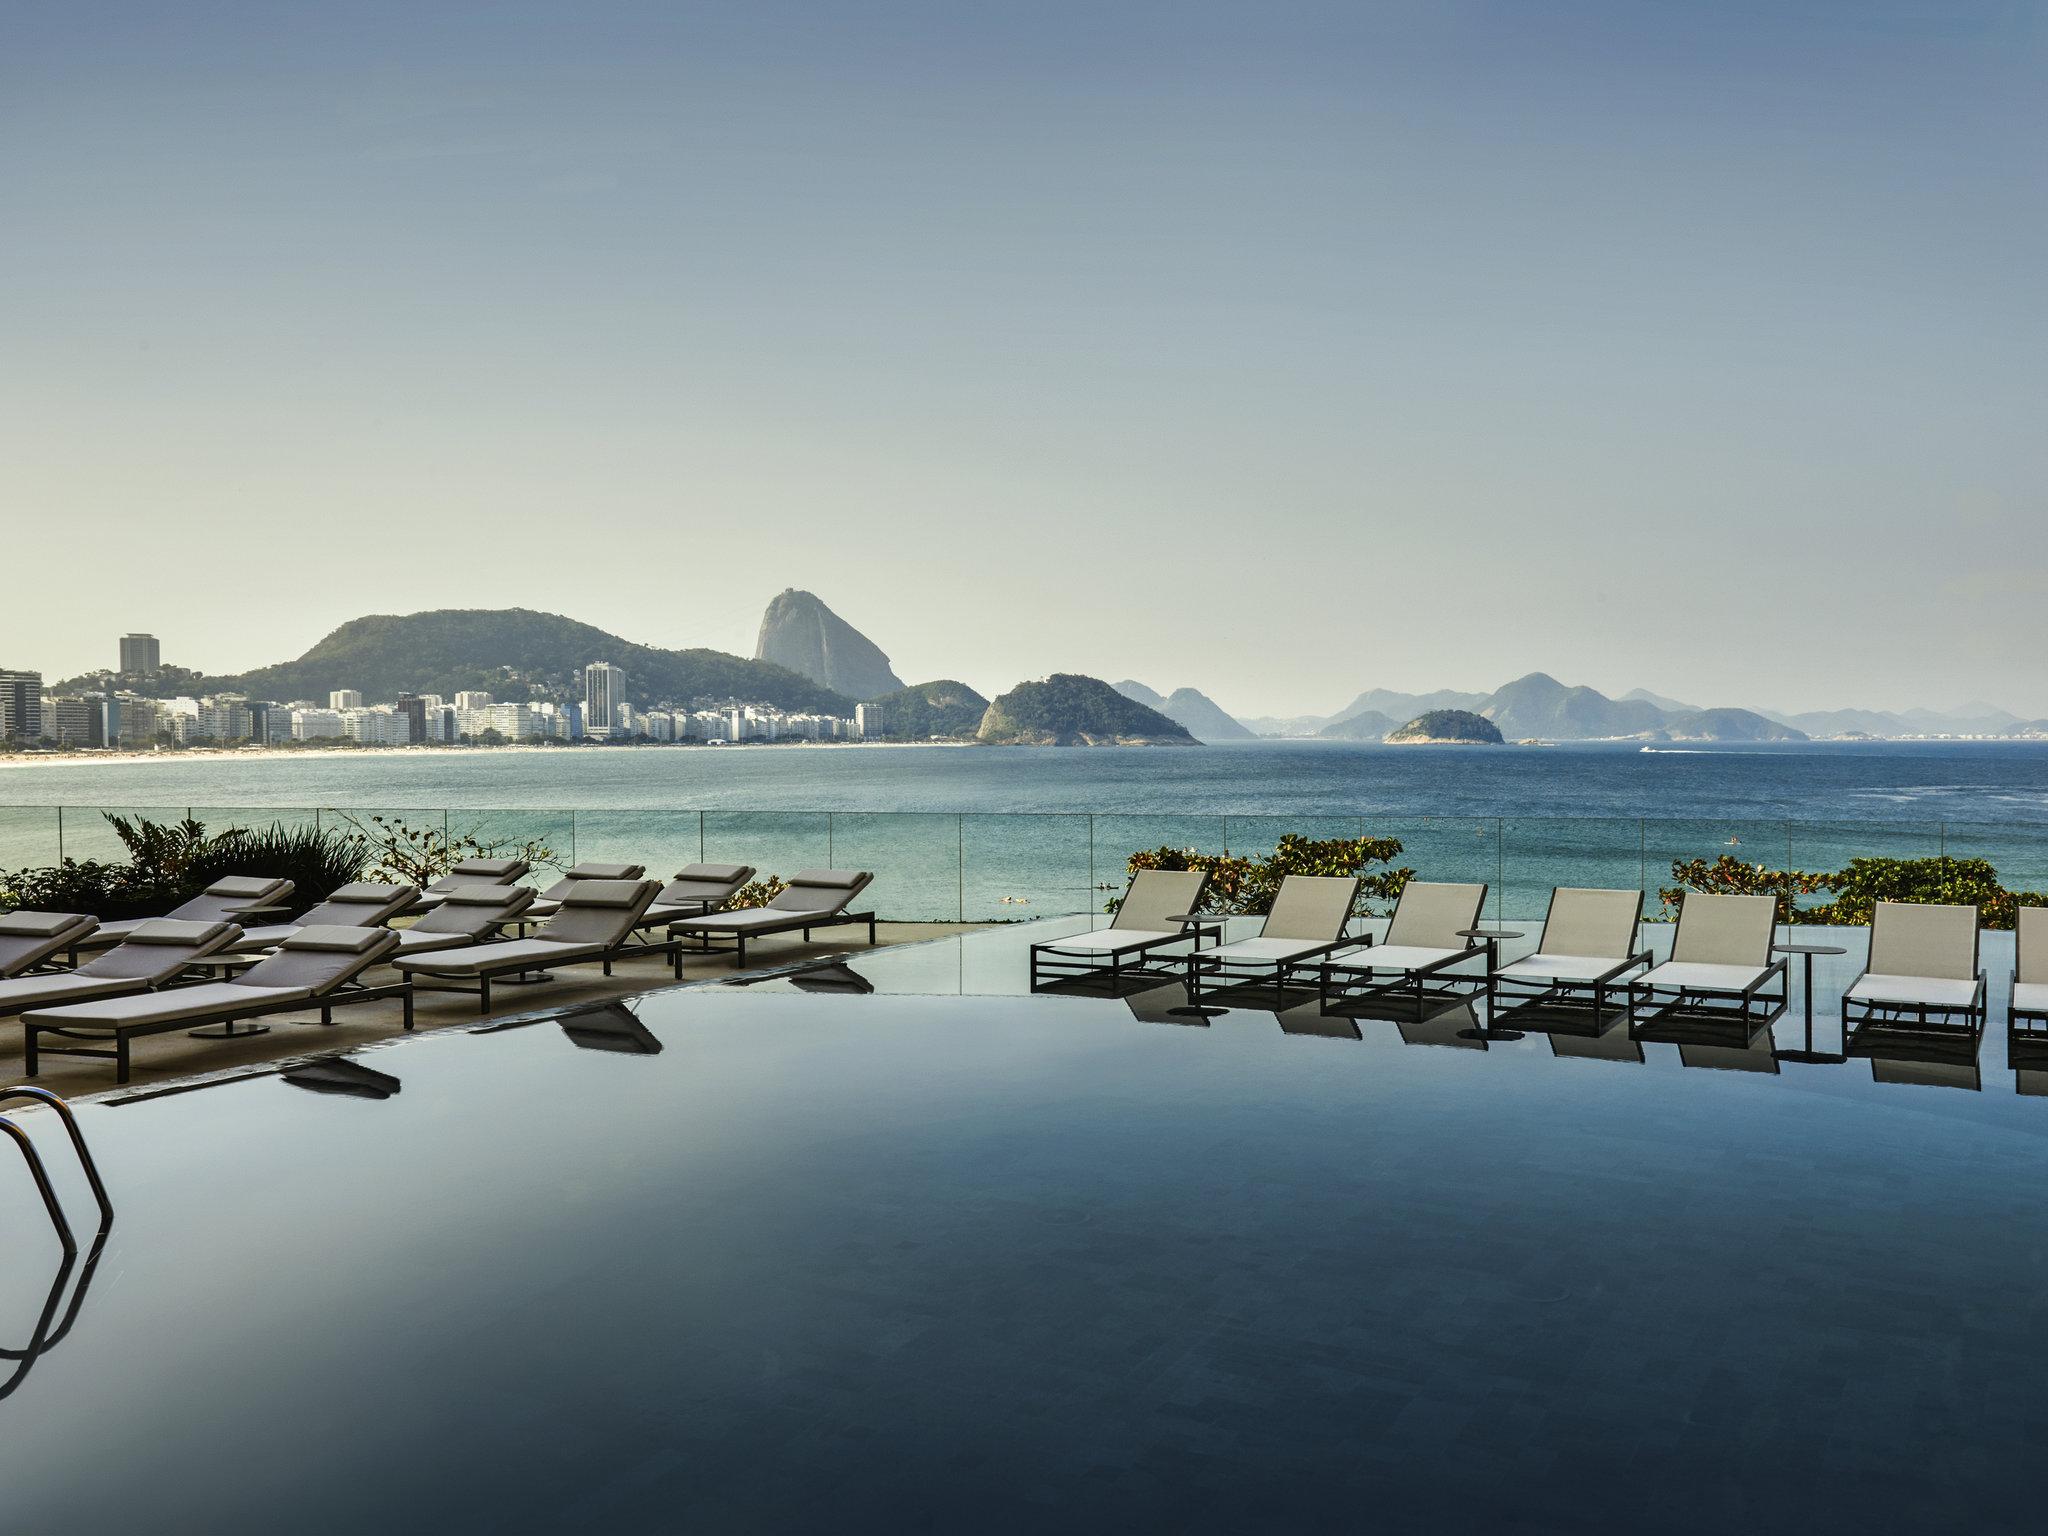 Hotel - Sofitel Rio Copacabana (future Fairmont; closed for renovation)